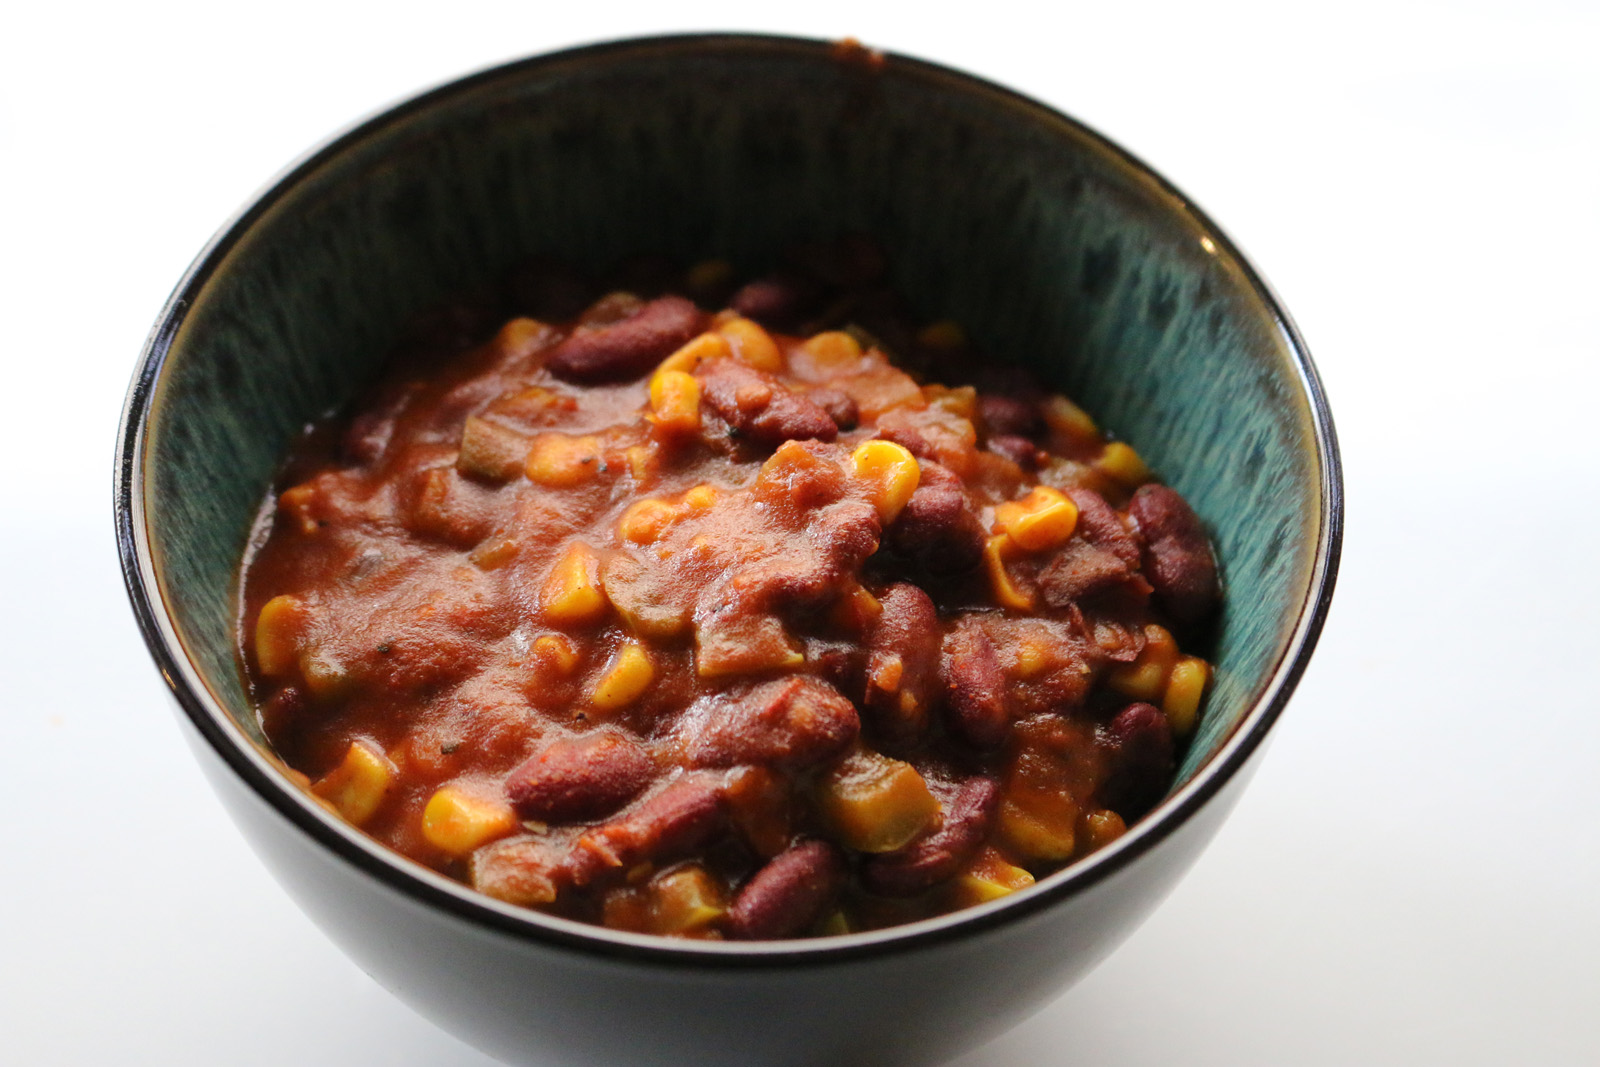 Dorm Dining Vegan Rice Cooker Chili Delivers Complex Flavors Despite Simple Recipe Daily Bruin